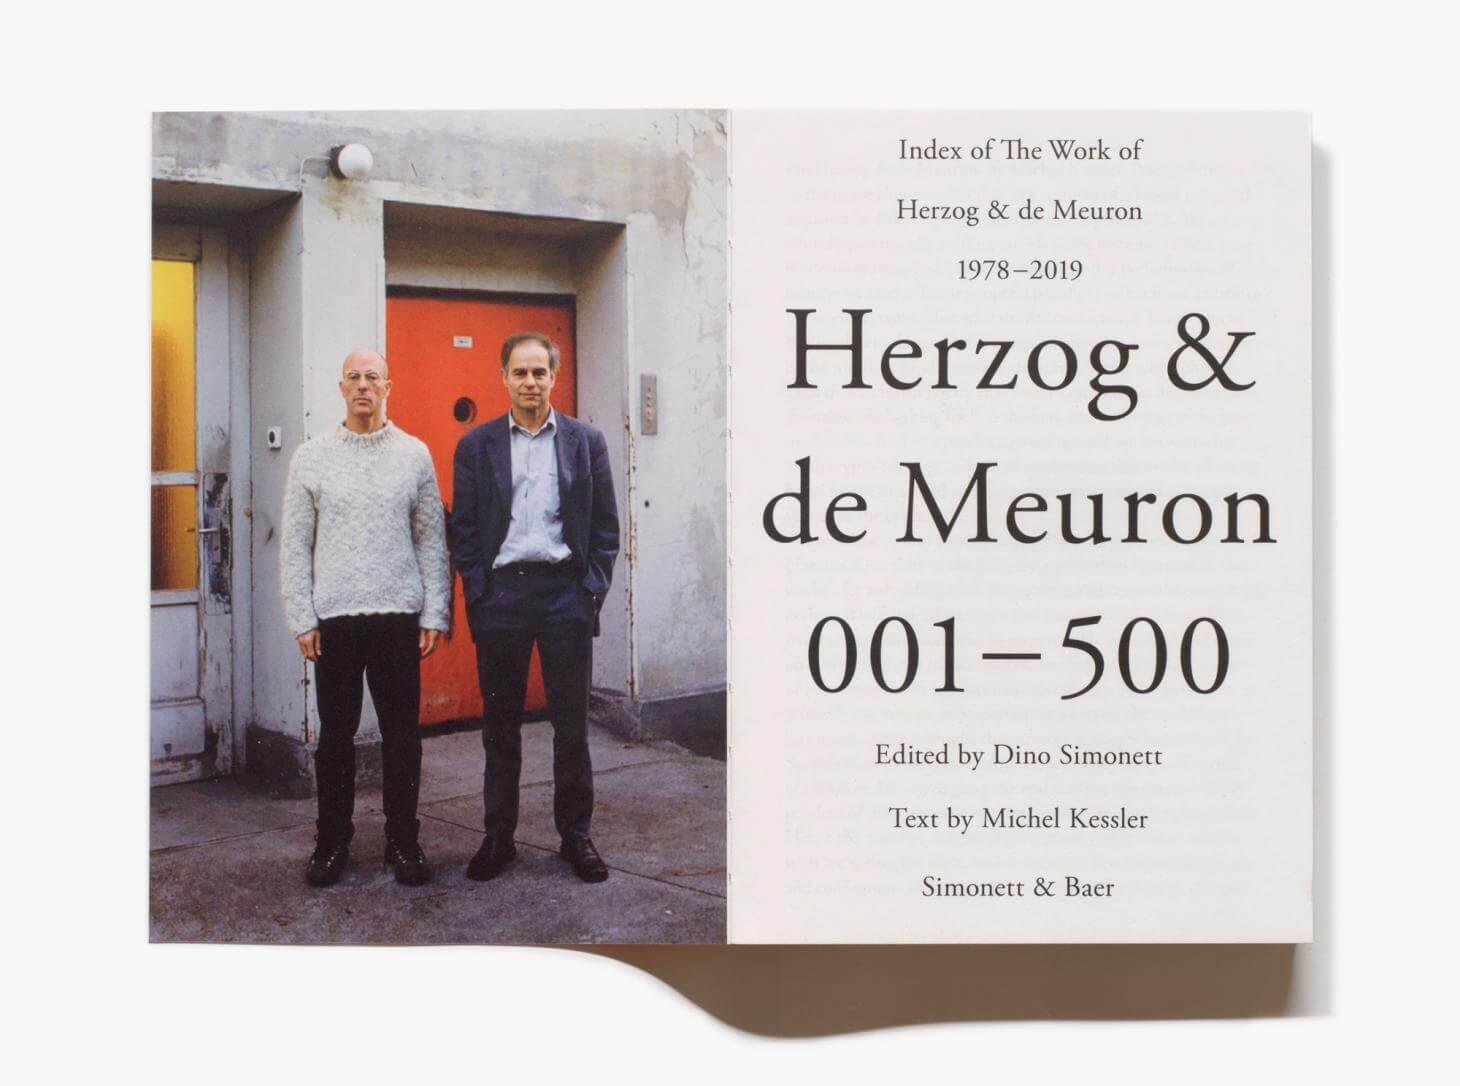 每周一书:Simonett & Baer《Herzog & de Meuron 001 - 500》-BlueDotCC, 蓝点文化创意